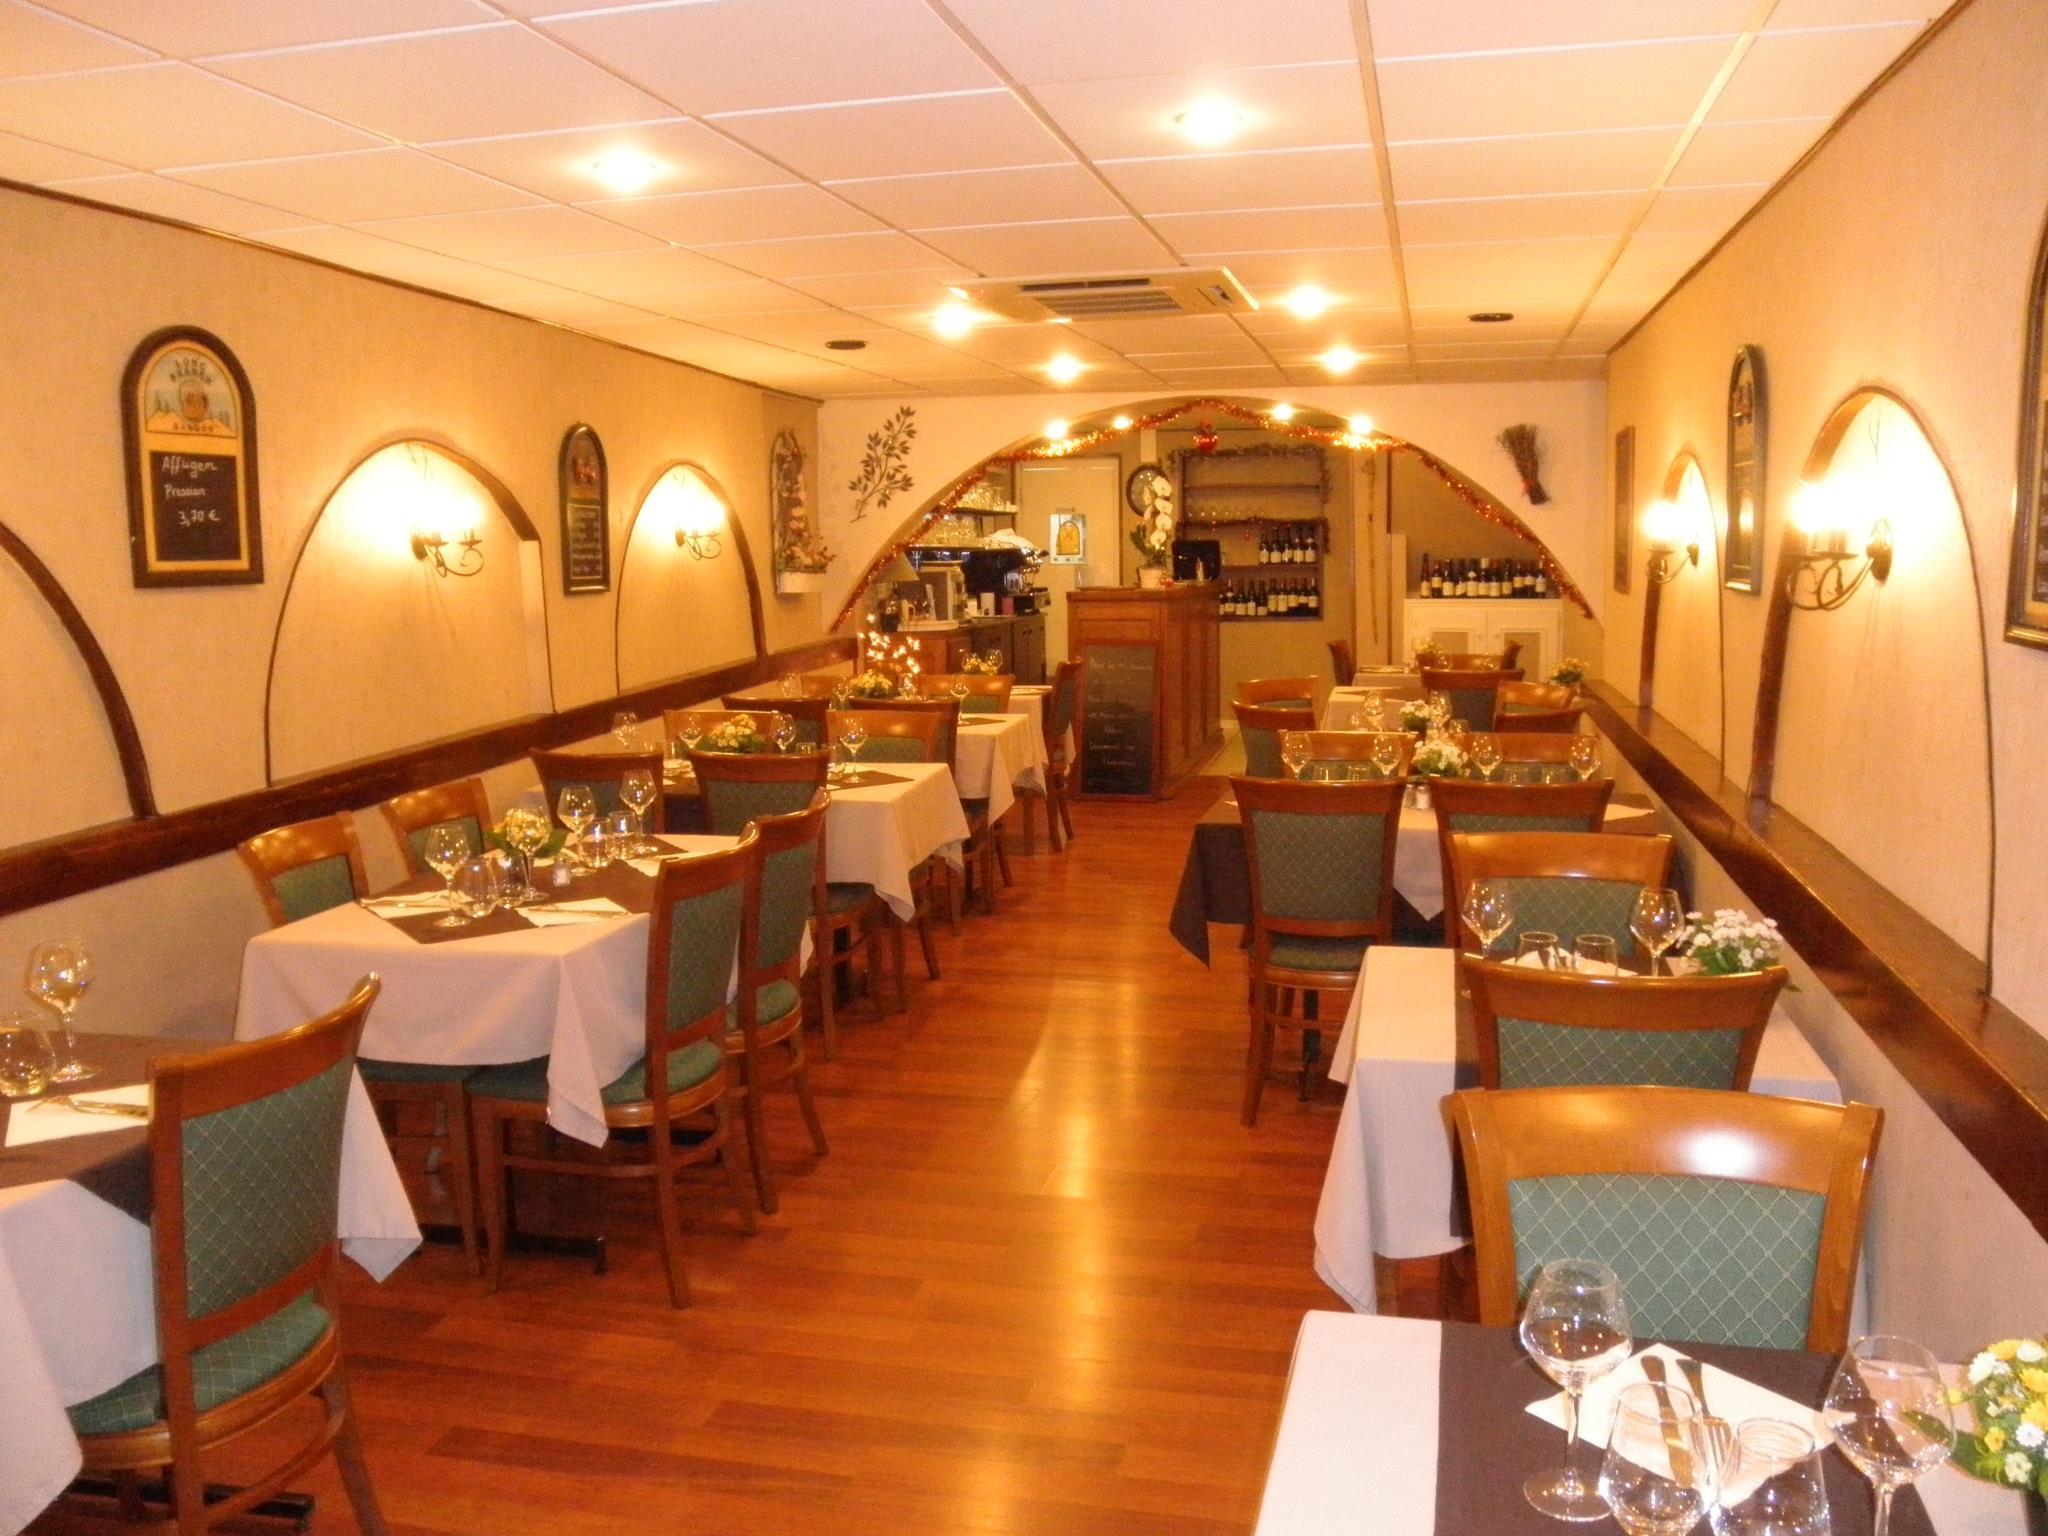 la charrette market fresh restaurant saint omer 62500. Black Bedroom Furniture Sets. Home Design Ideas